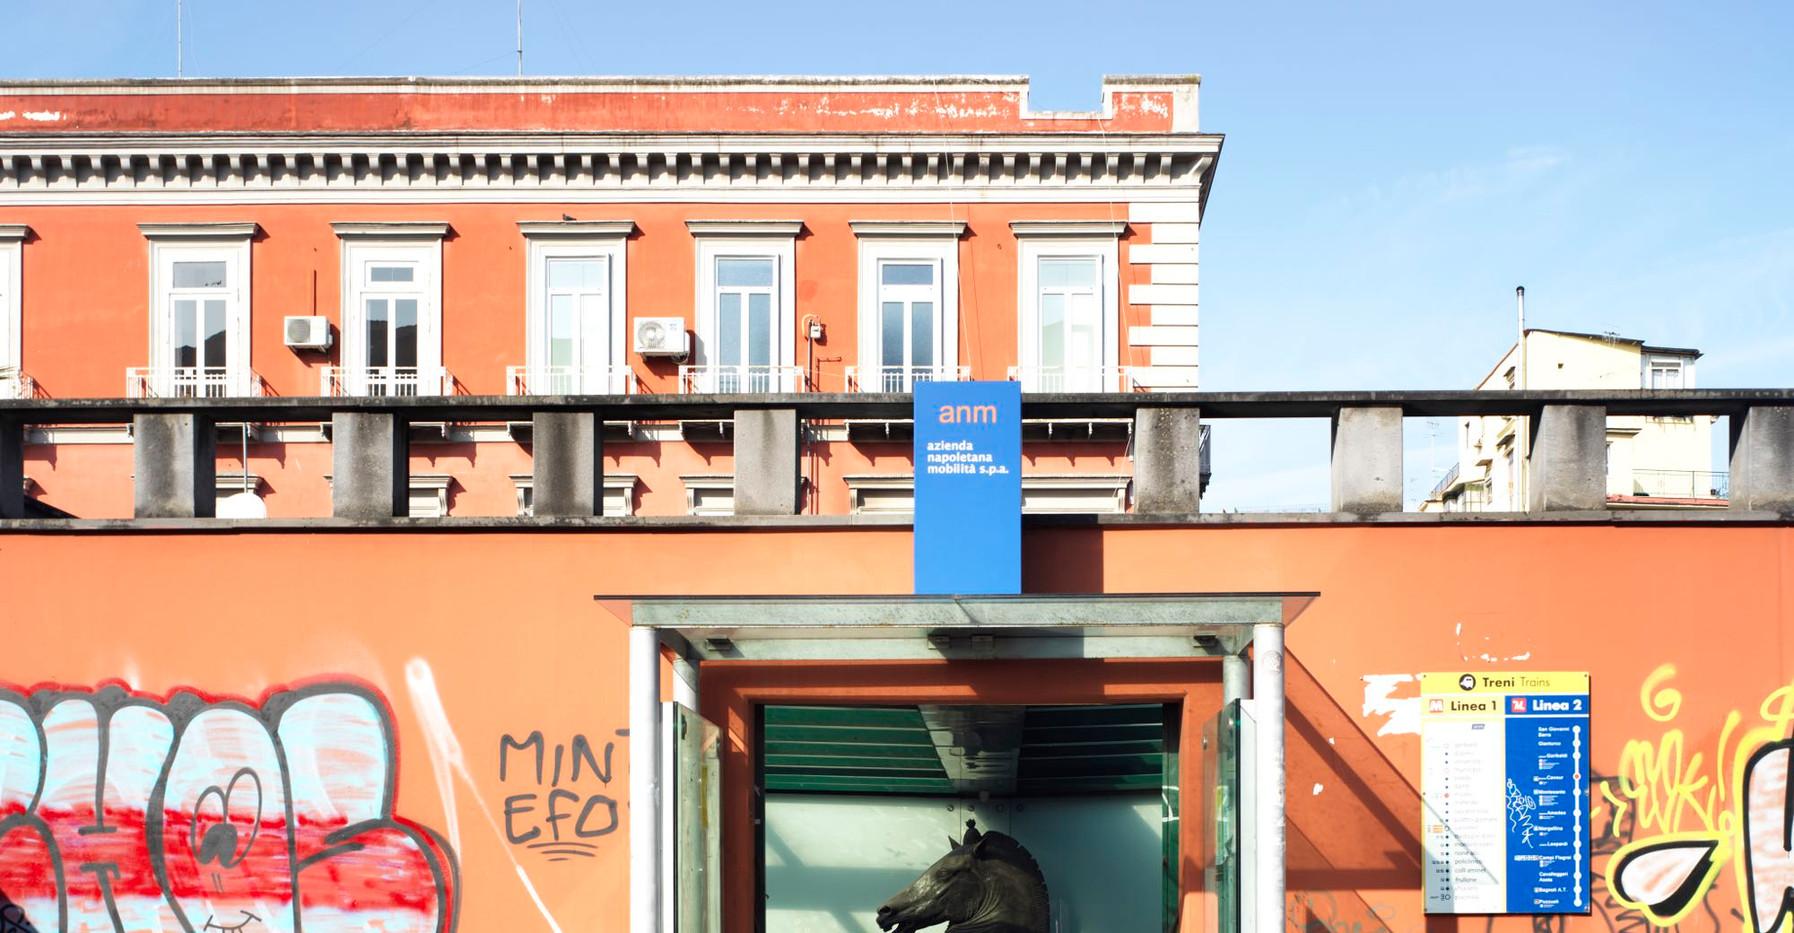 Napoli#02